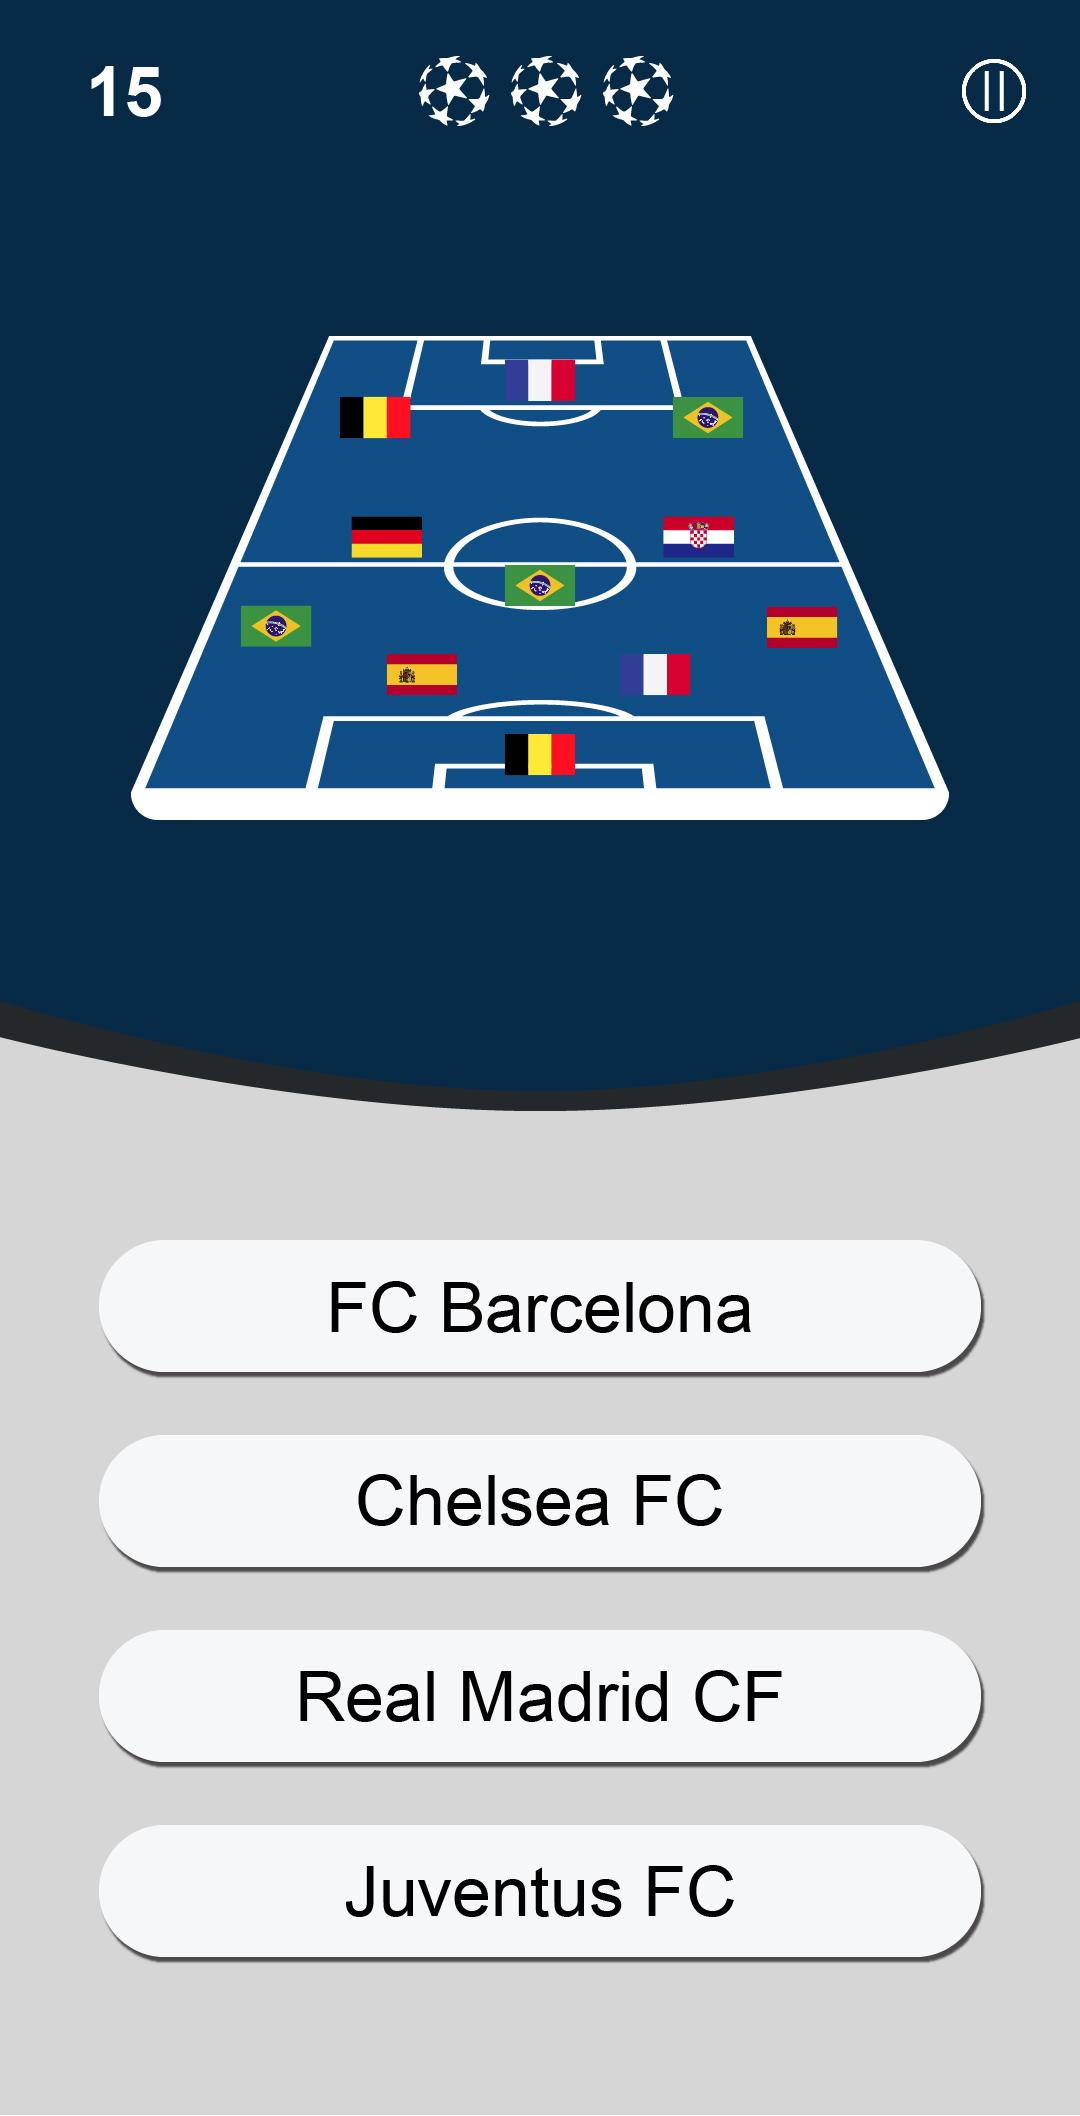 Gess the football club